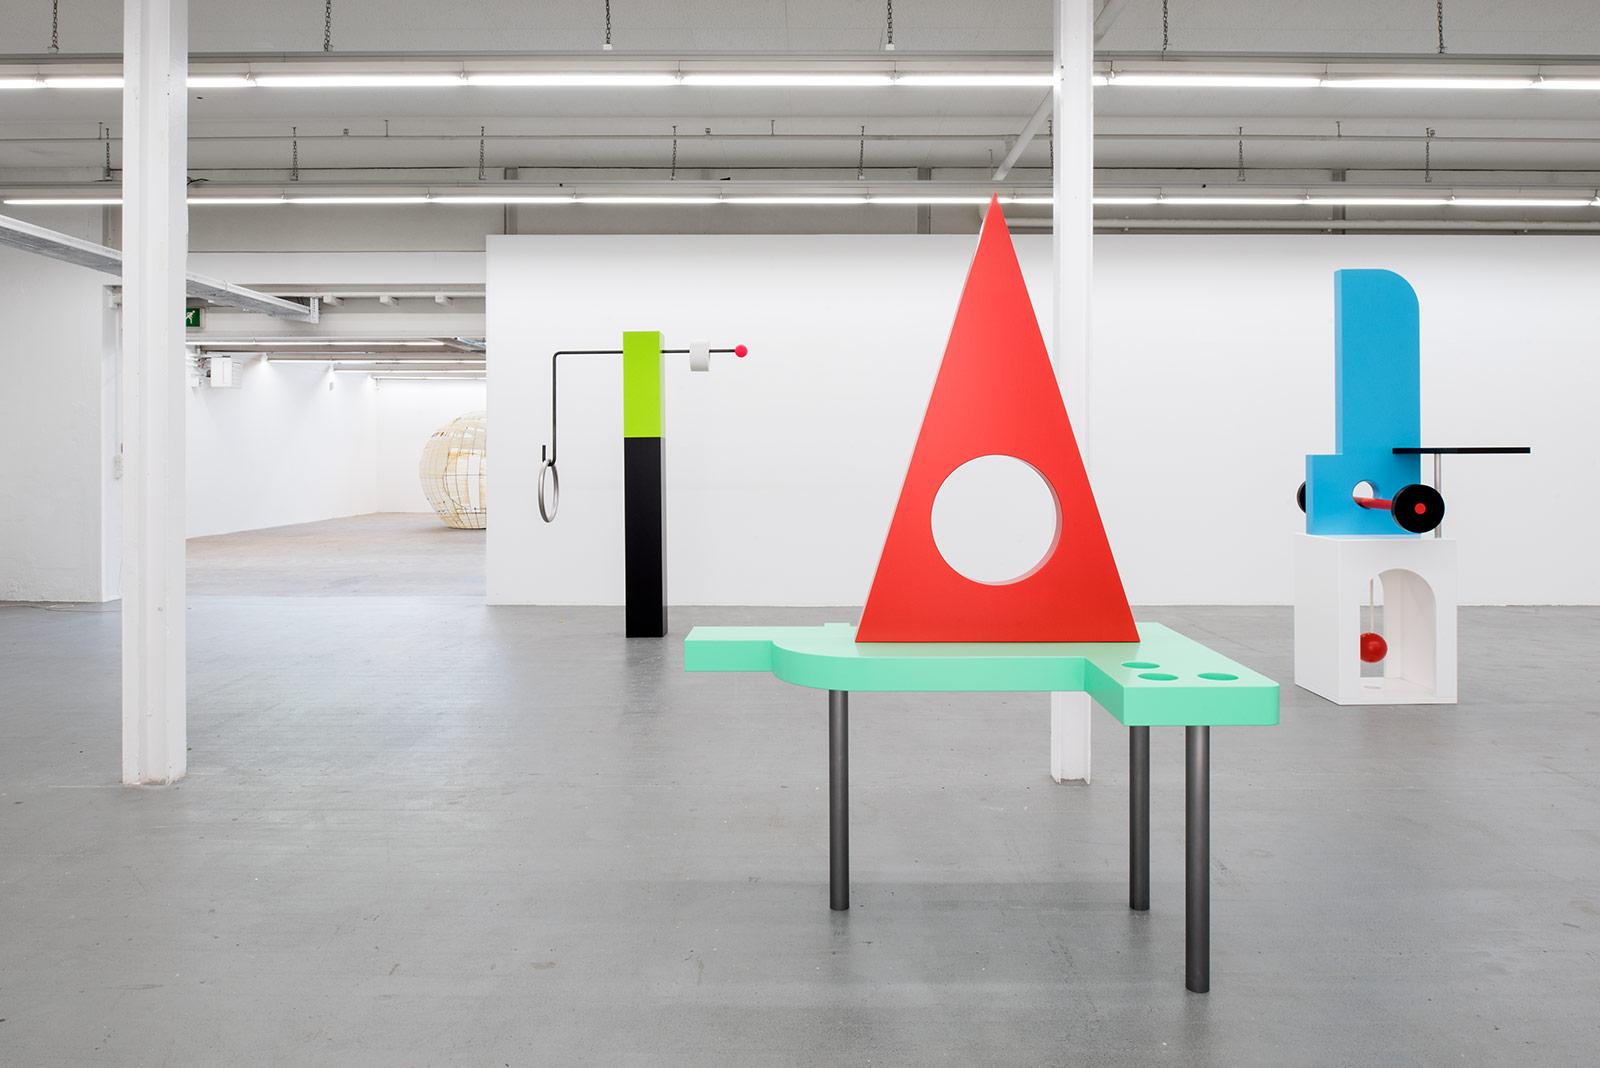 Laura Mietrup – Institut Kunst, Diplom 2017